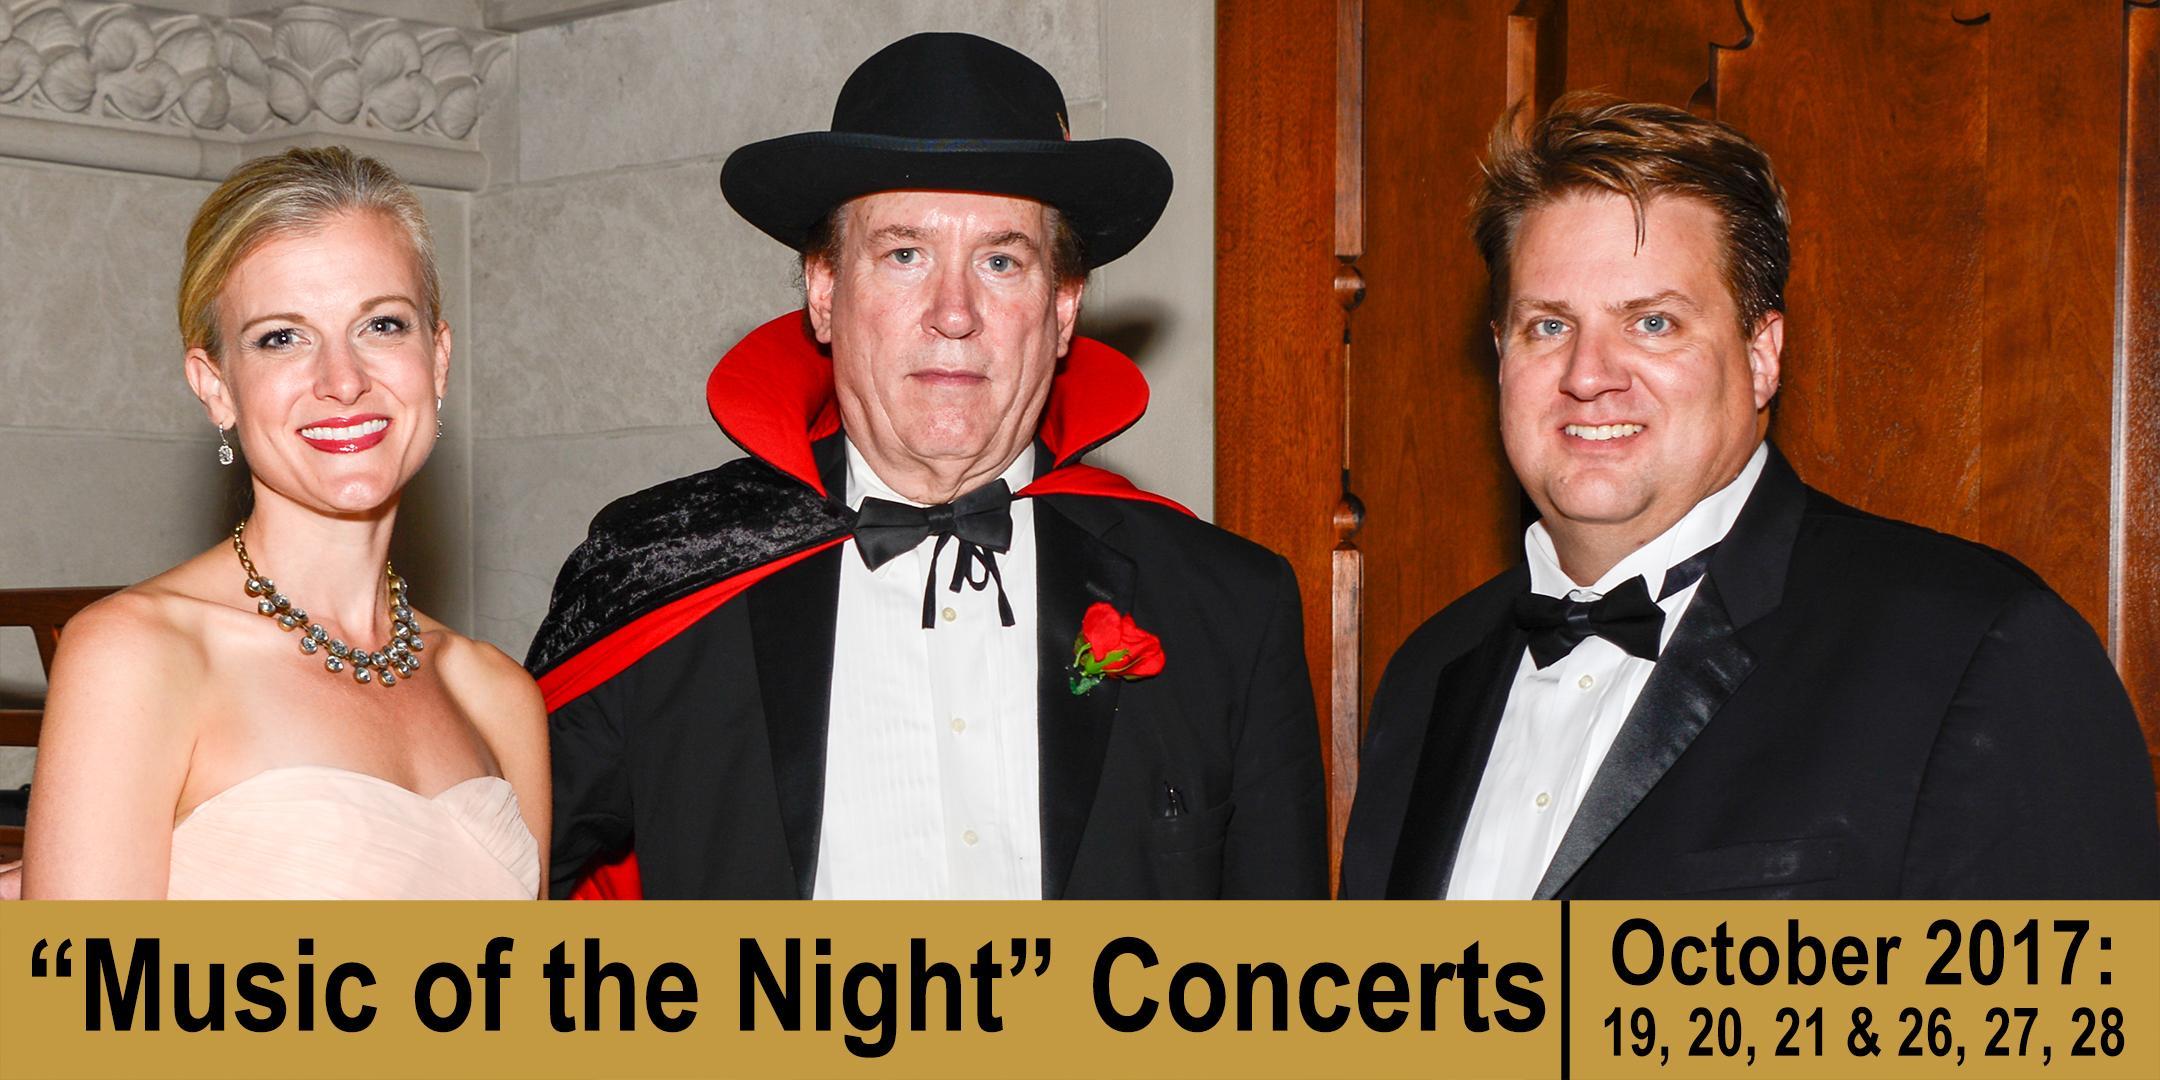 """Music of the Night"" Concert (THURSDAY, 10/26/17)"